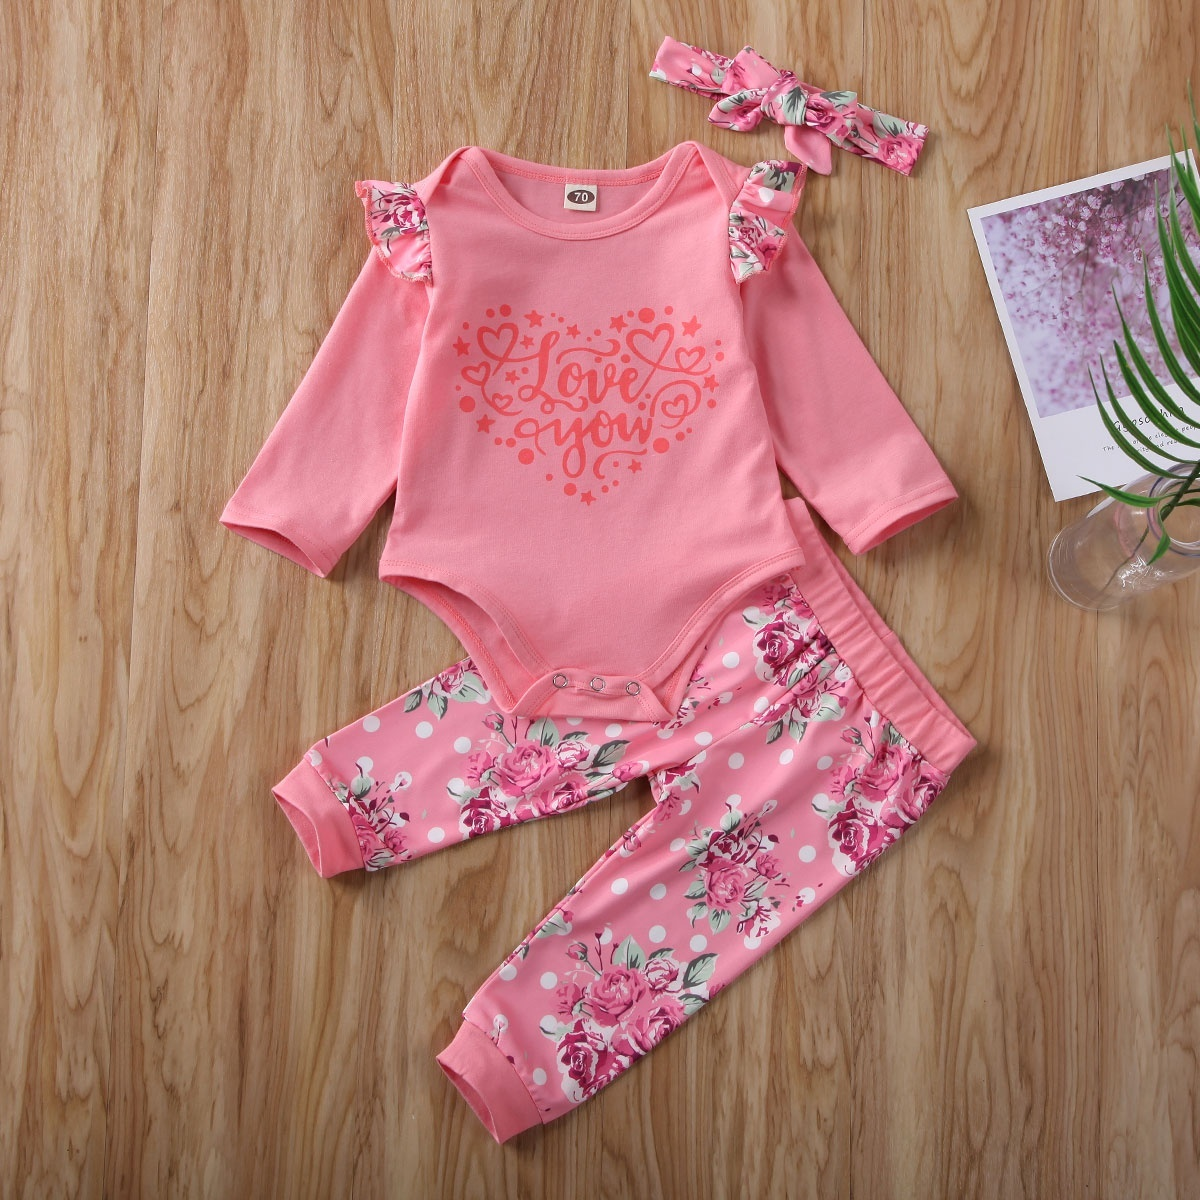 NEW Toddler Baby Girls Boys Long Sleeve Valentine Day Love-heart Romper Jumpsuit